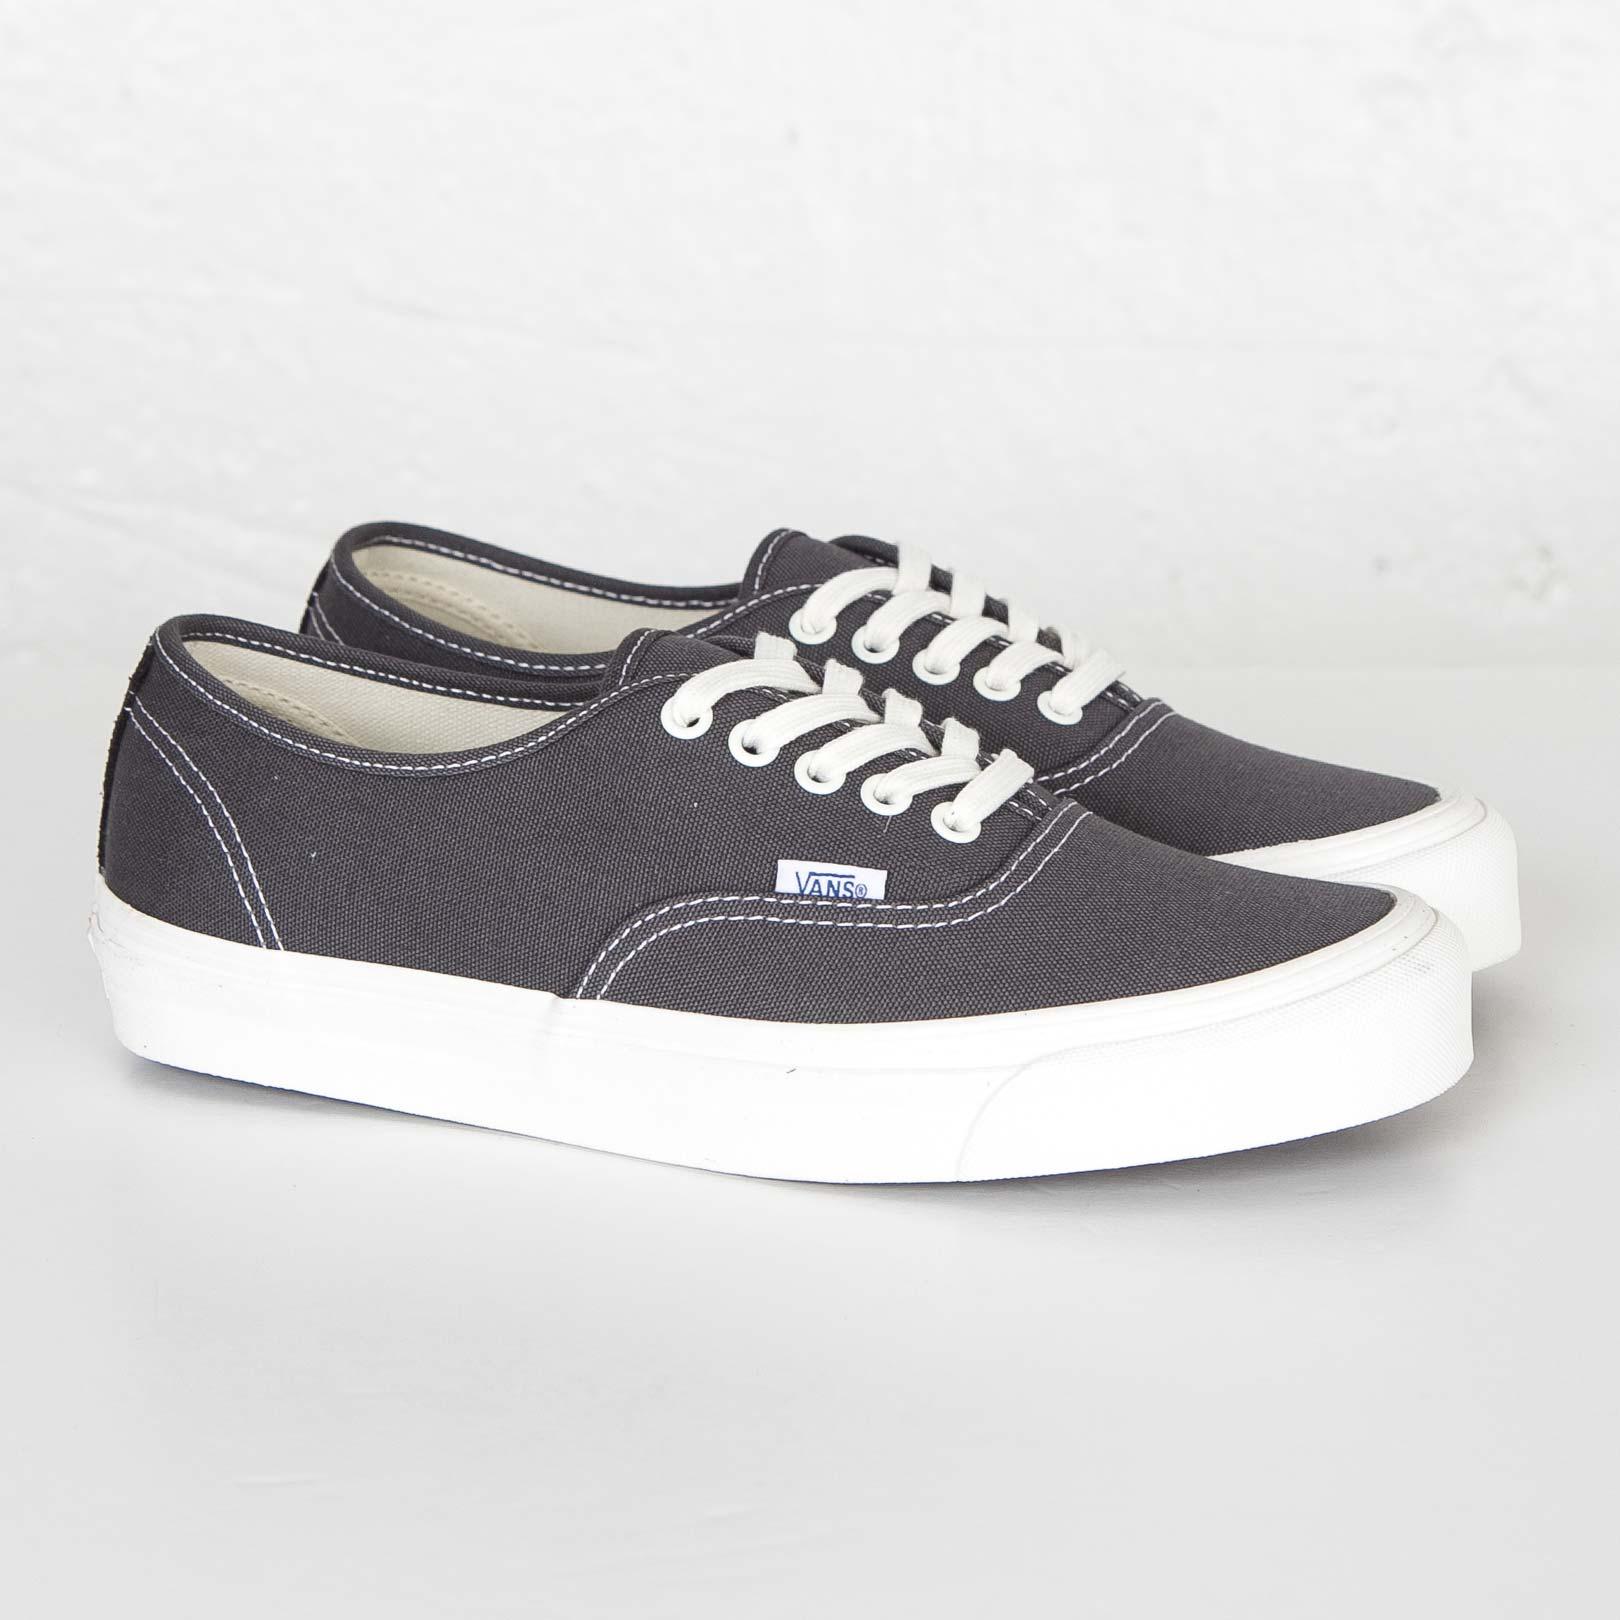 38f18605f9 Vans OG Authentic LX - Vuddiat - Sneakersnstuff